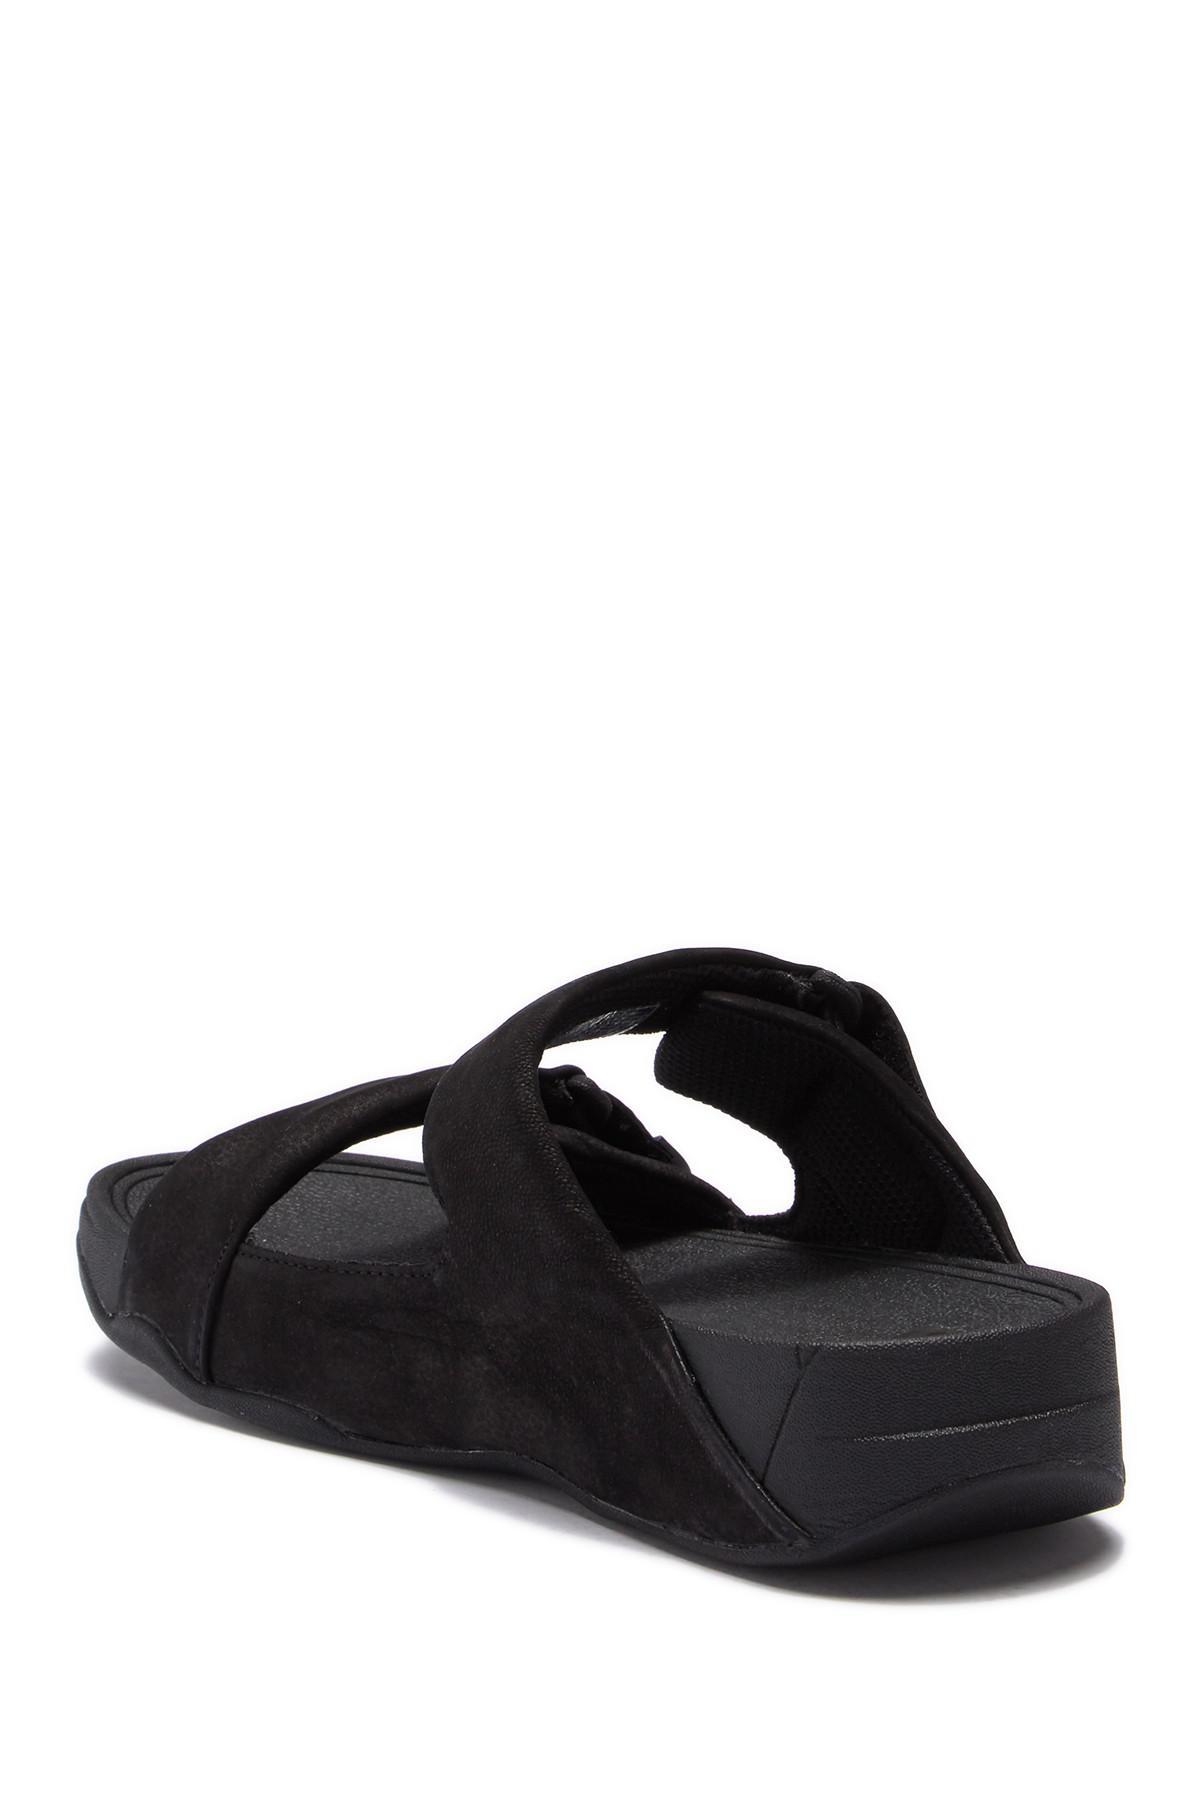 ffb6a2d25773 Fitflop - Black Gogh Moc Adjustable  s Slide Sandals for Men - Lyst. View  fullscreen